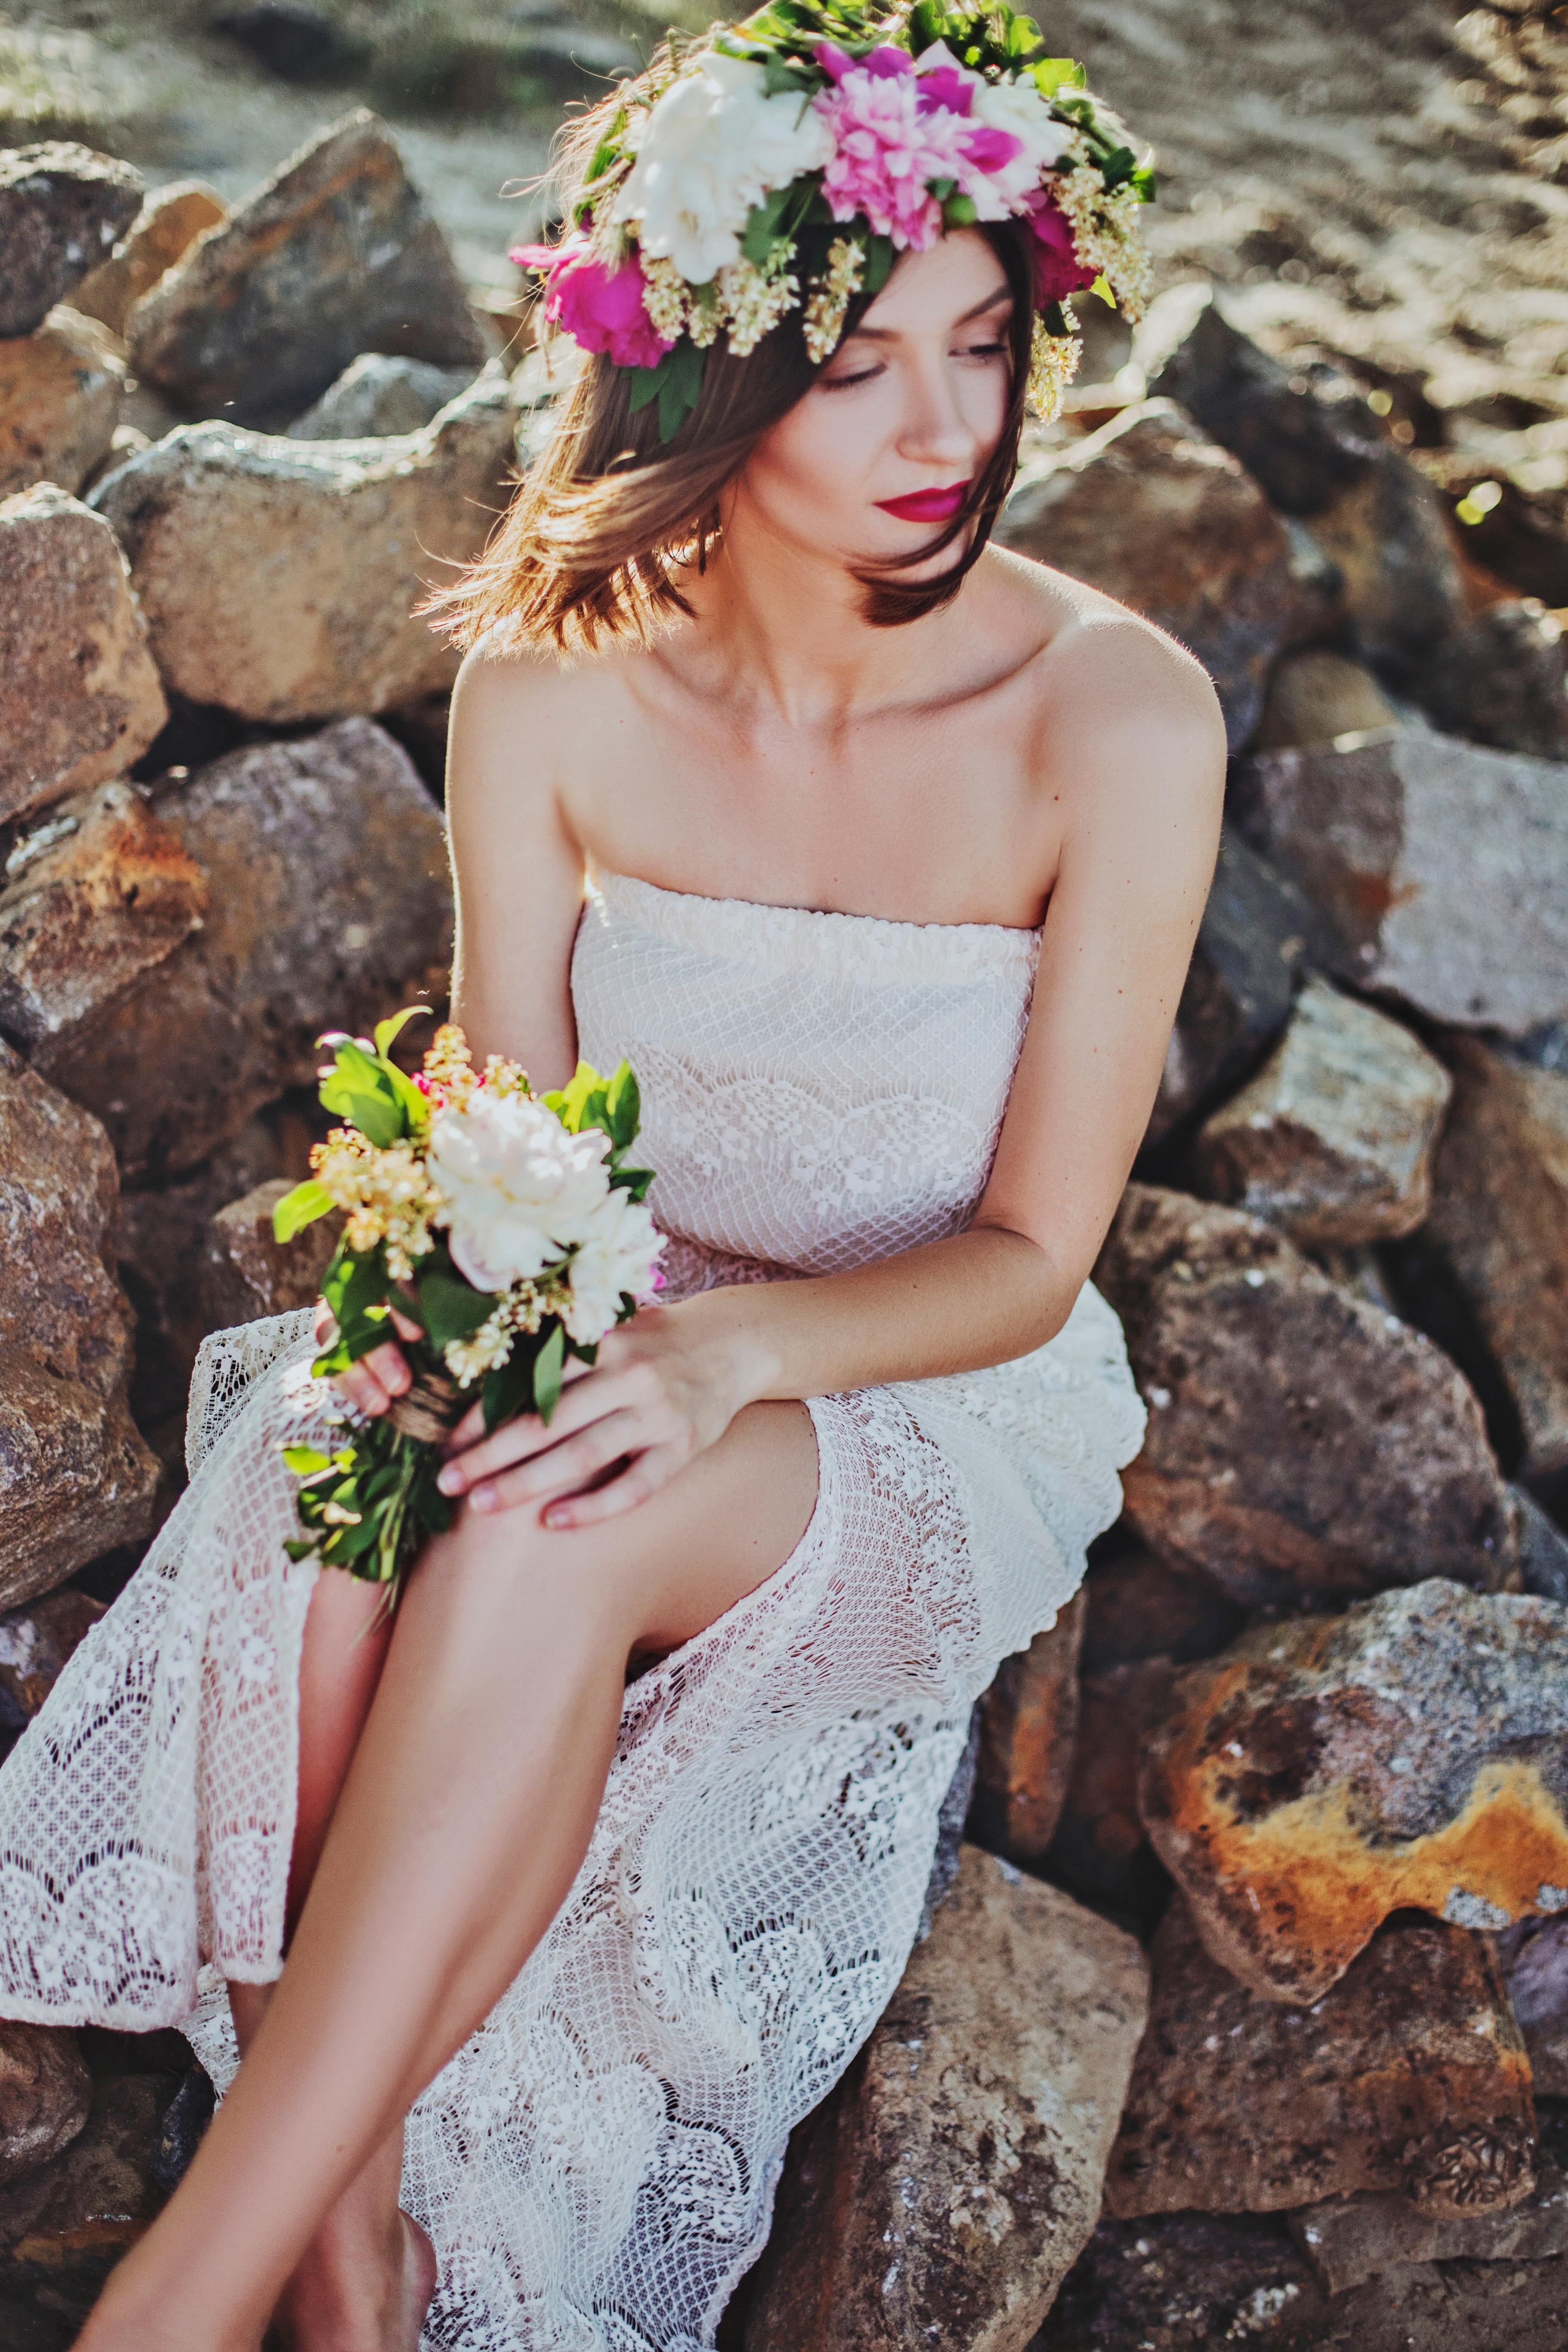 Kostenlose foto : Frau, Fotografie, Blume, Strauß, Frühling, Mode ...